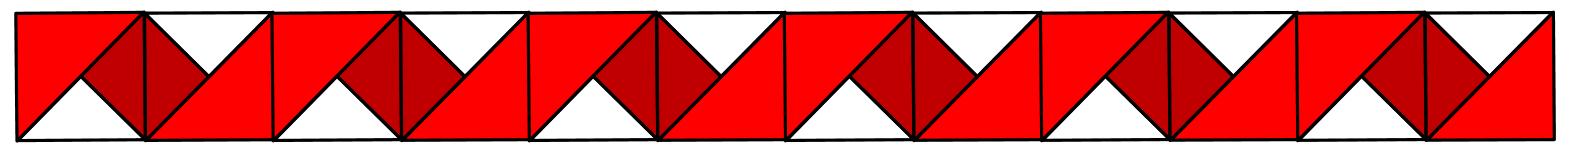 Diagram 8 - Rainbow Ribbons Quilt